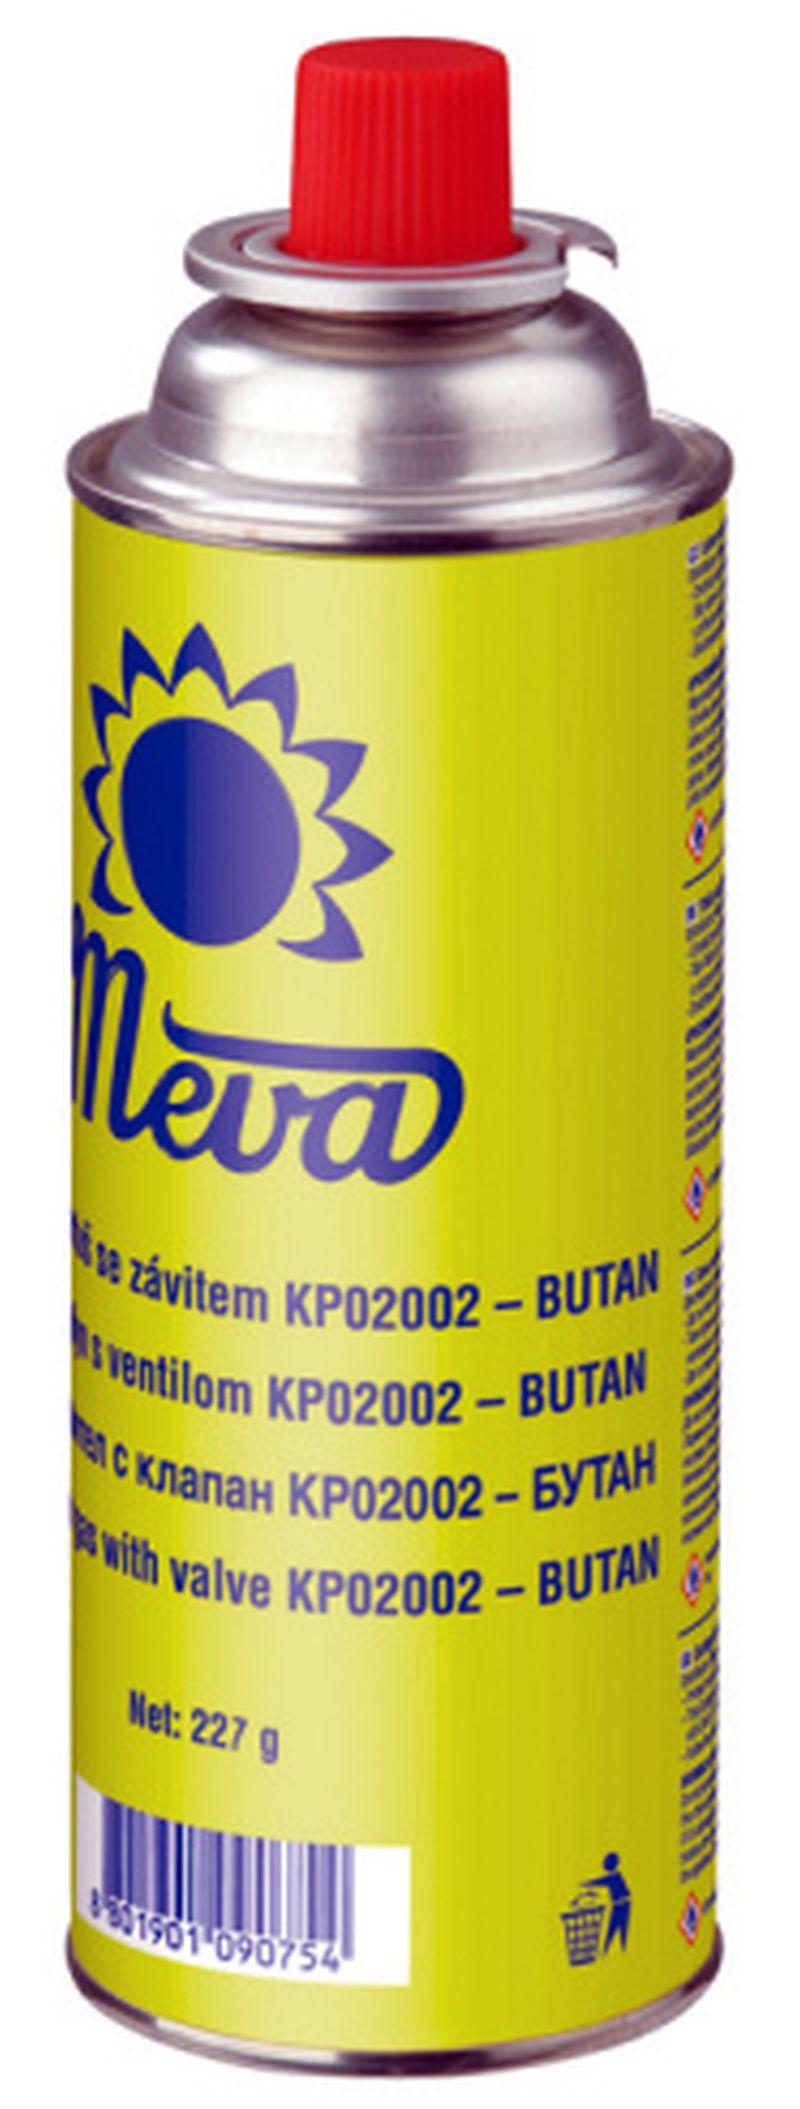 MEVA Kartuše Propan - Butan 227 g KP02002